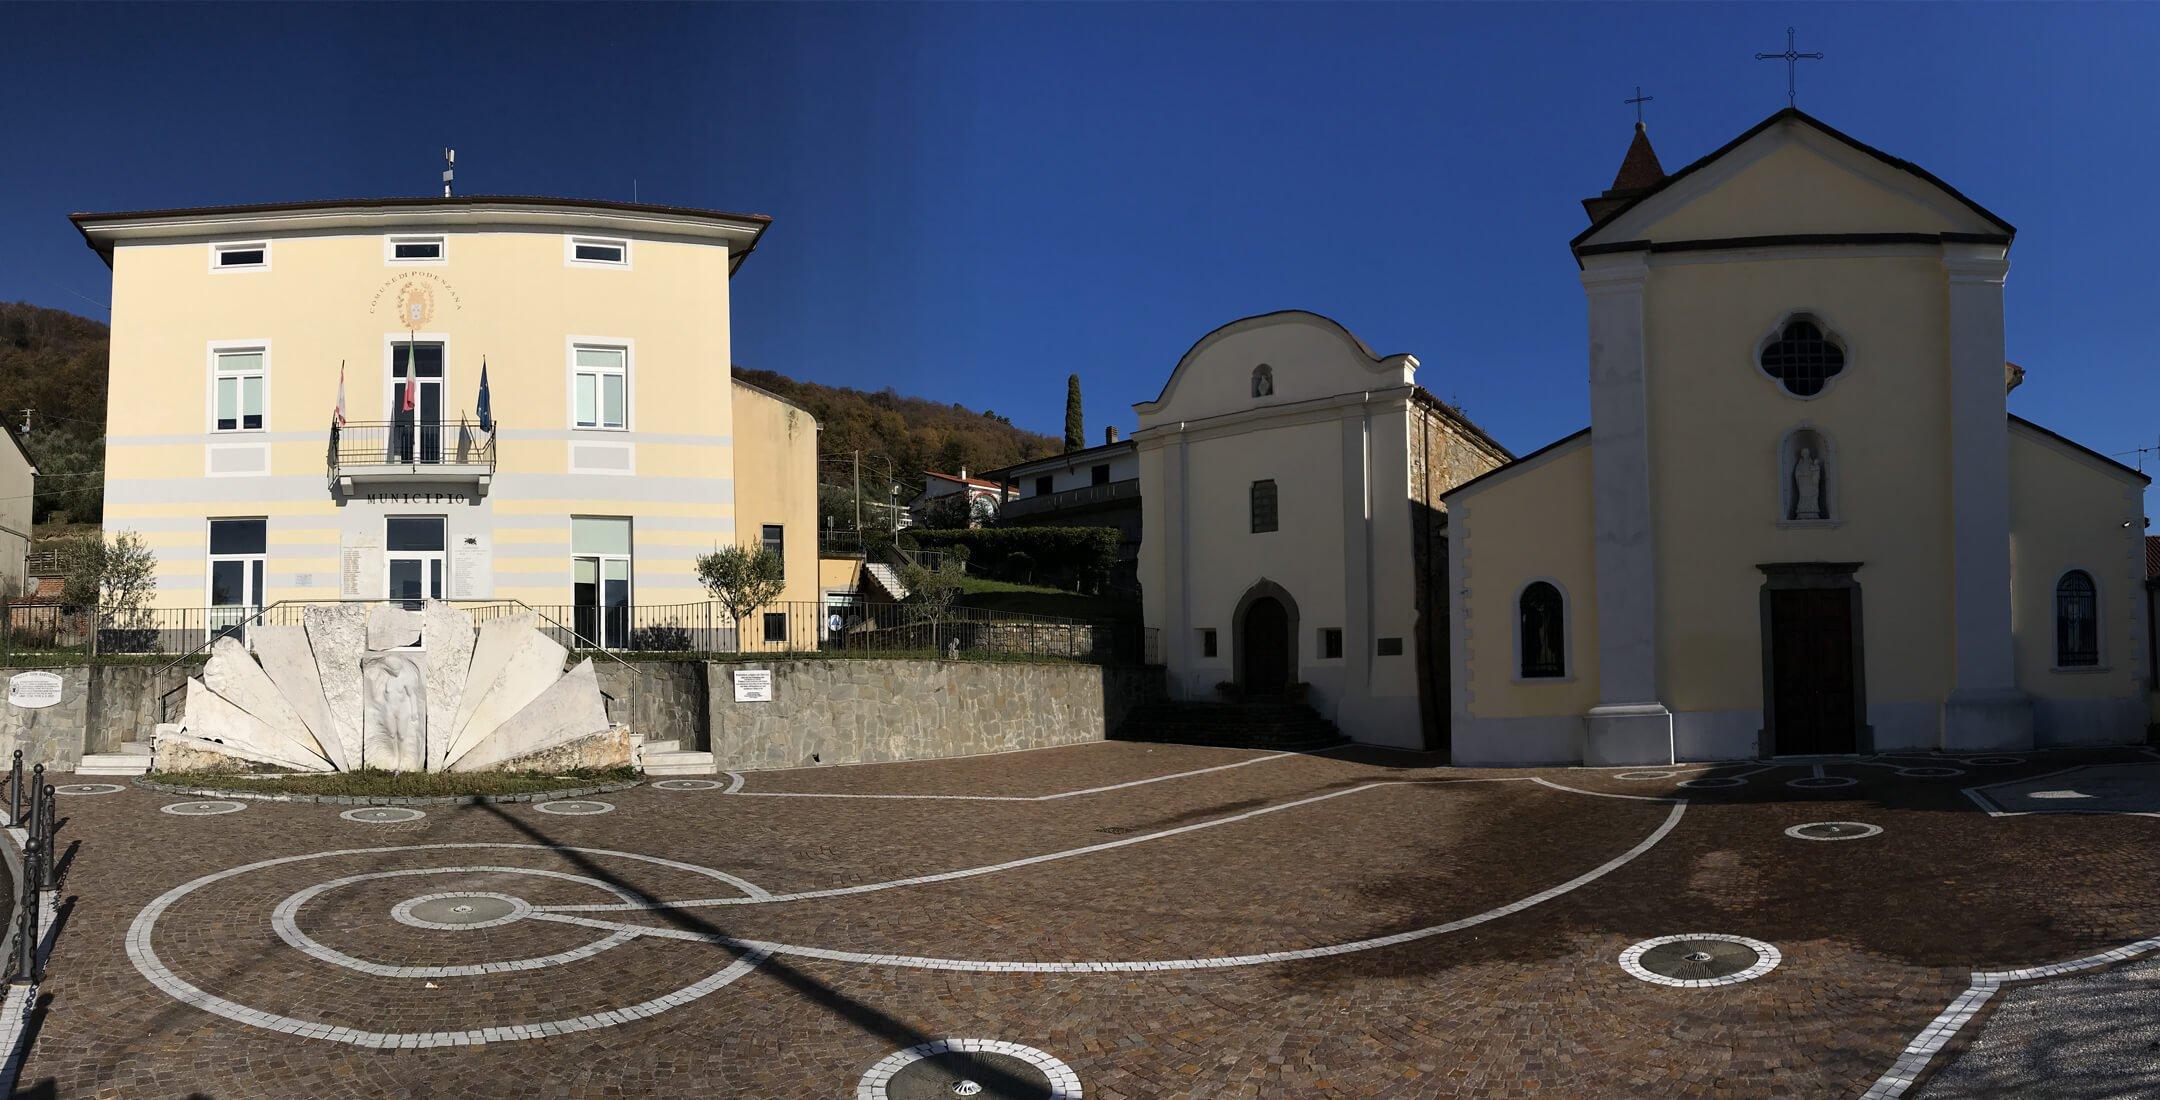 Centro storico di Podenzana